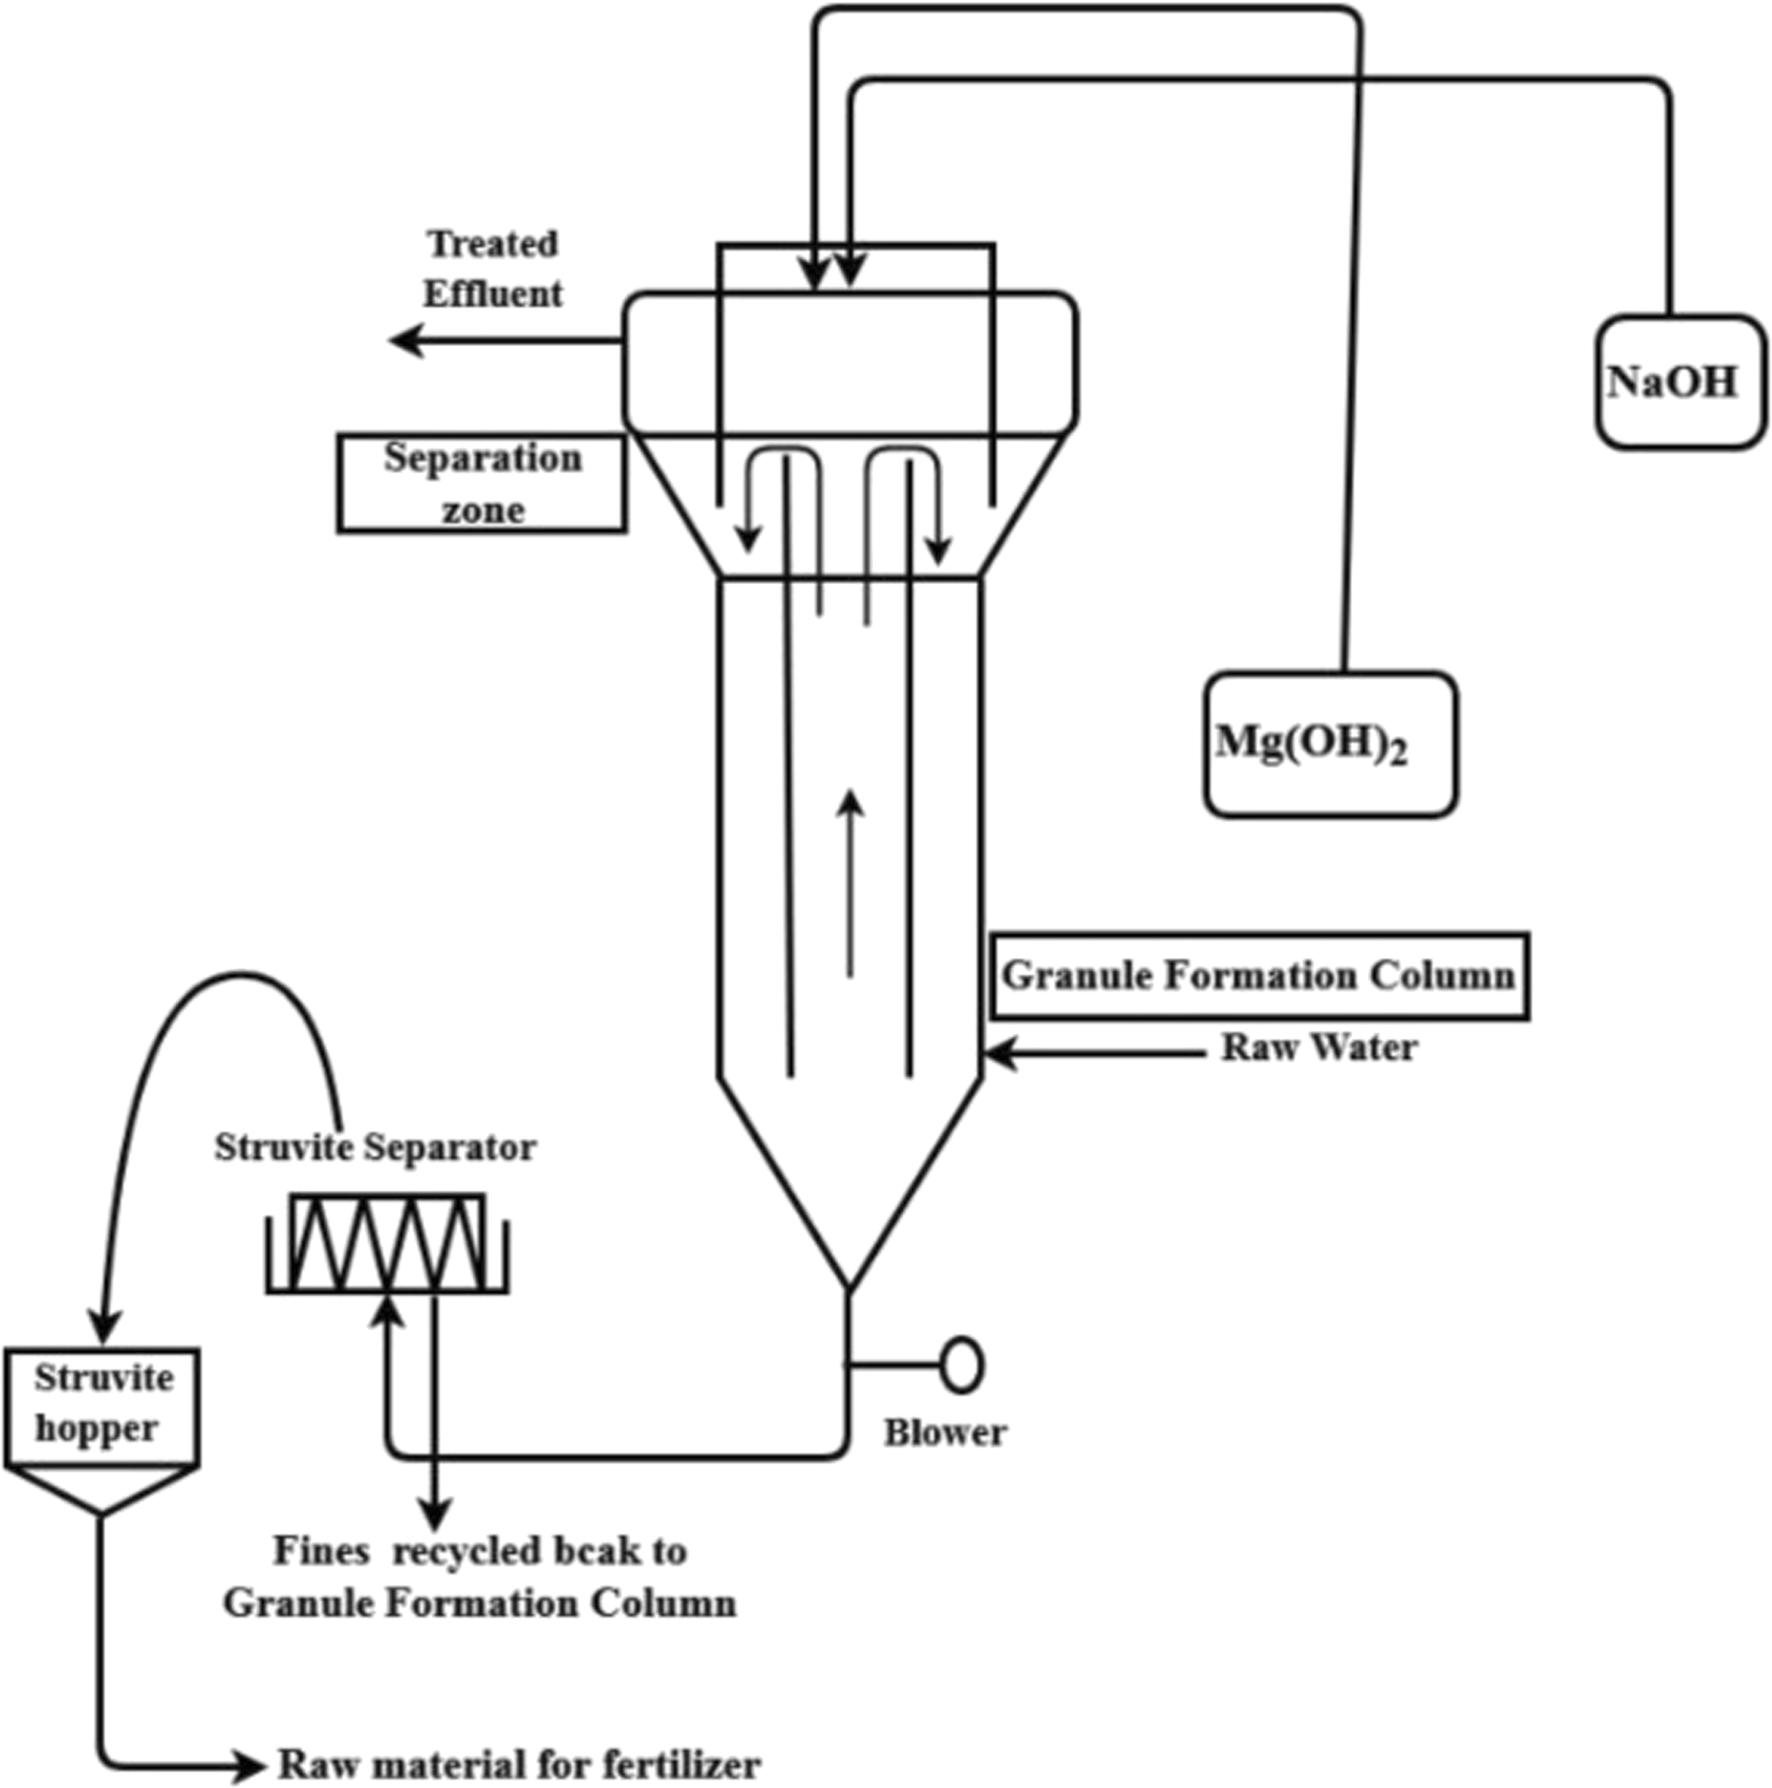 Oldham Septic Pumps Wiring Diagram. . Wiring Diagram on